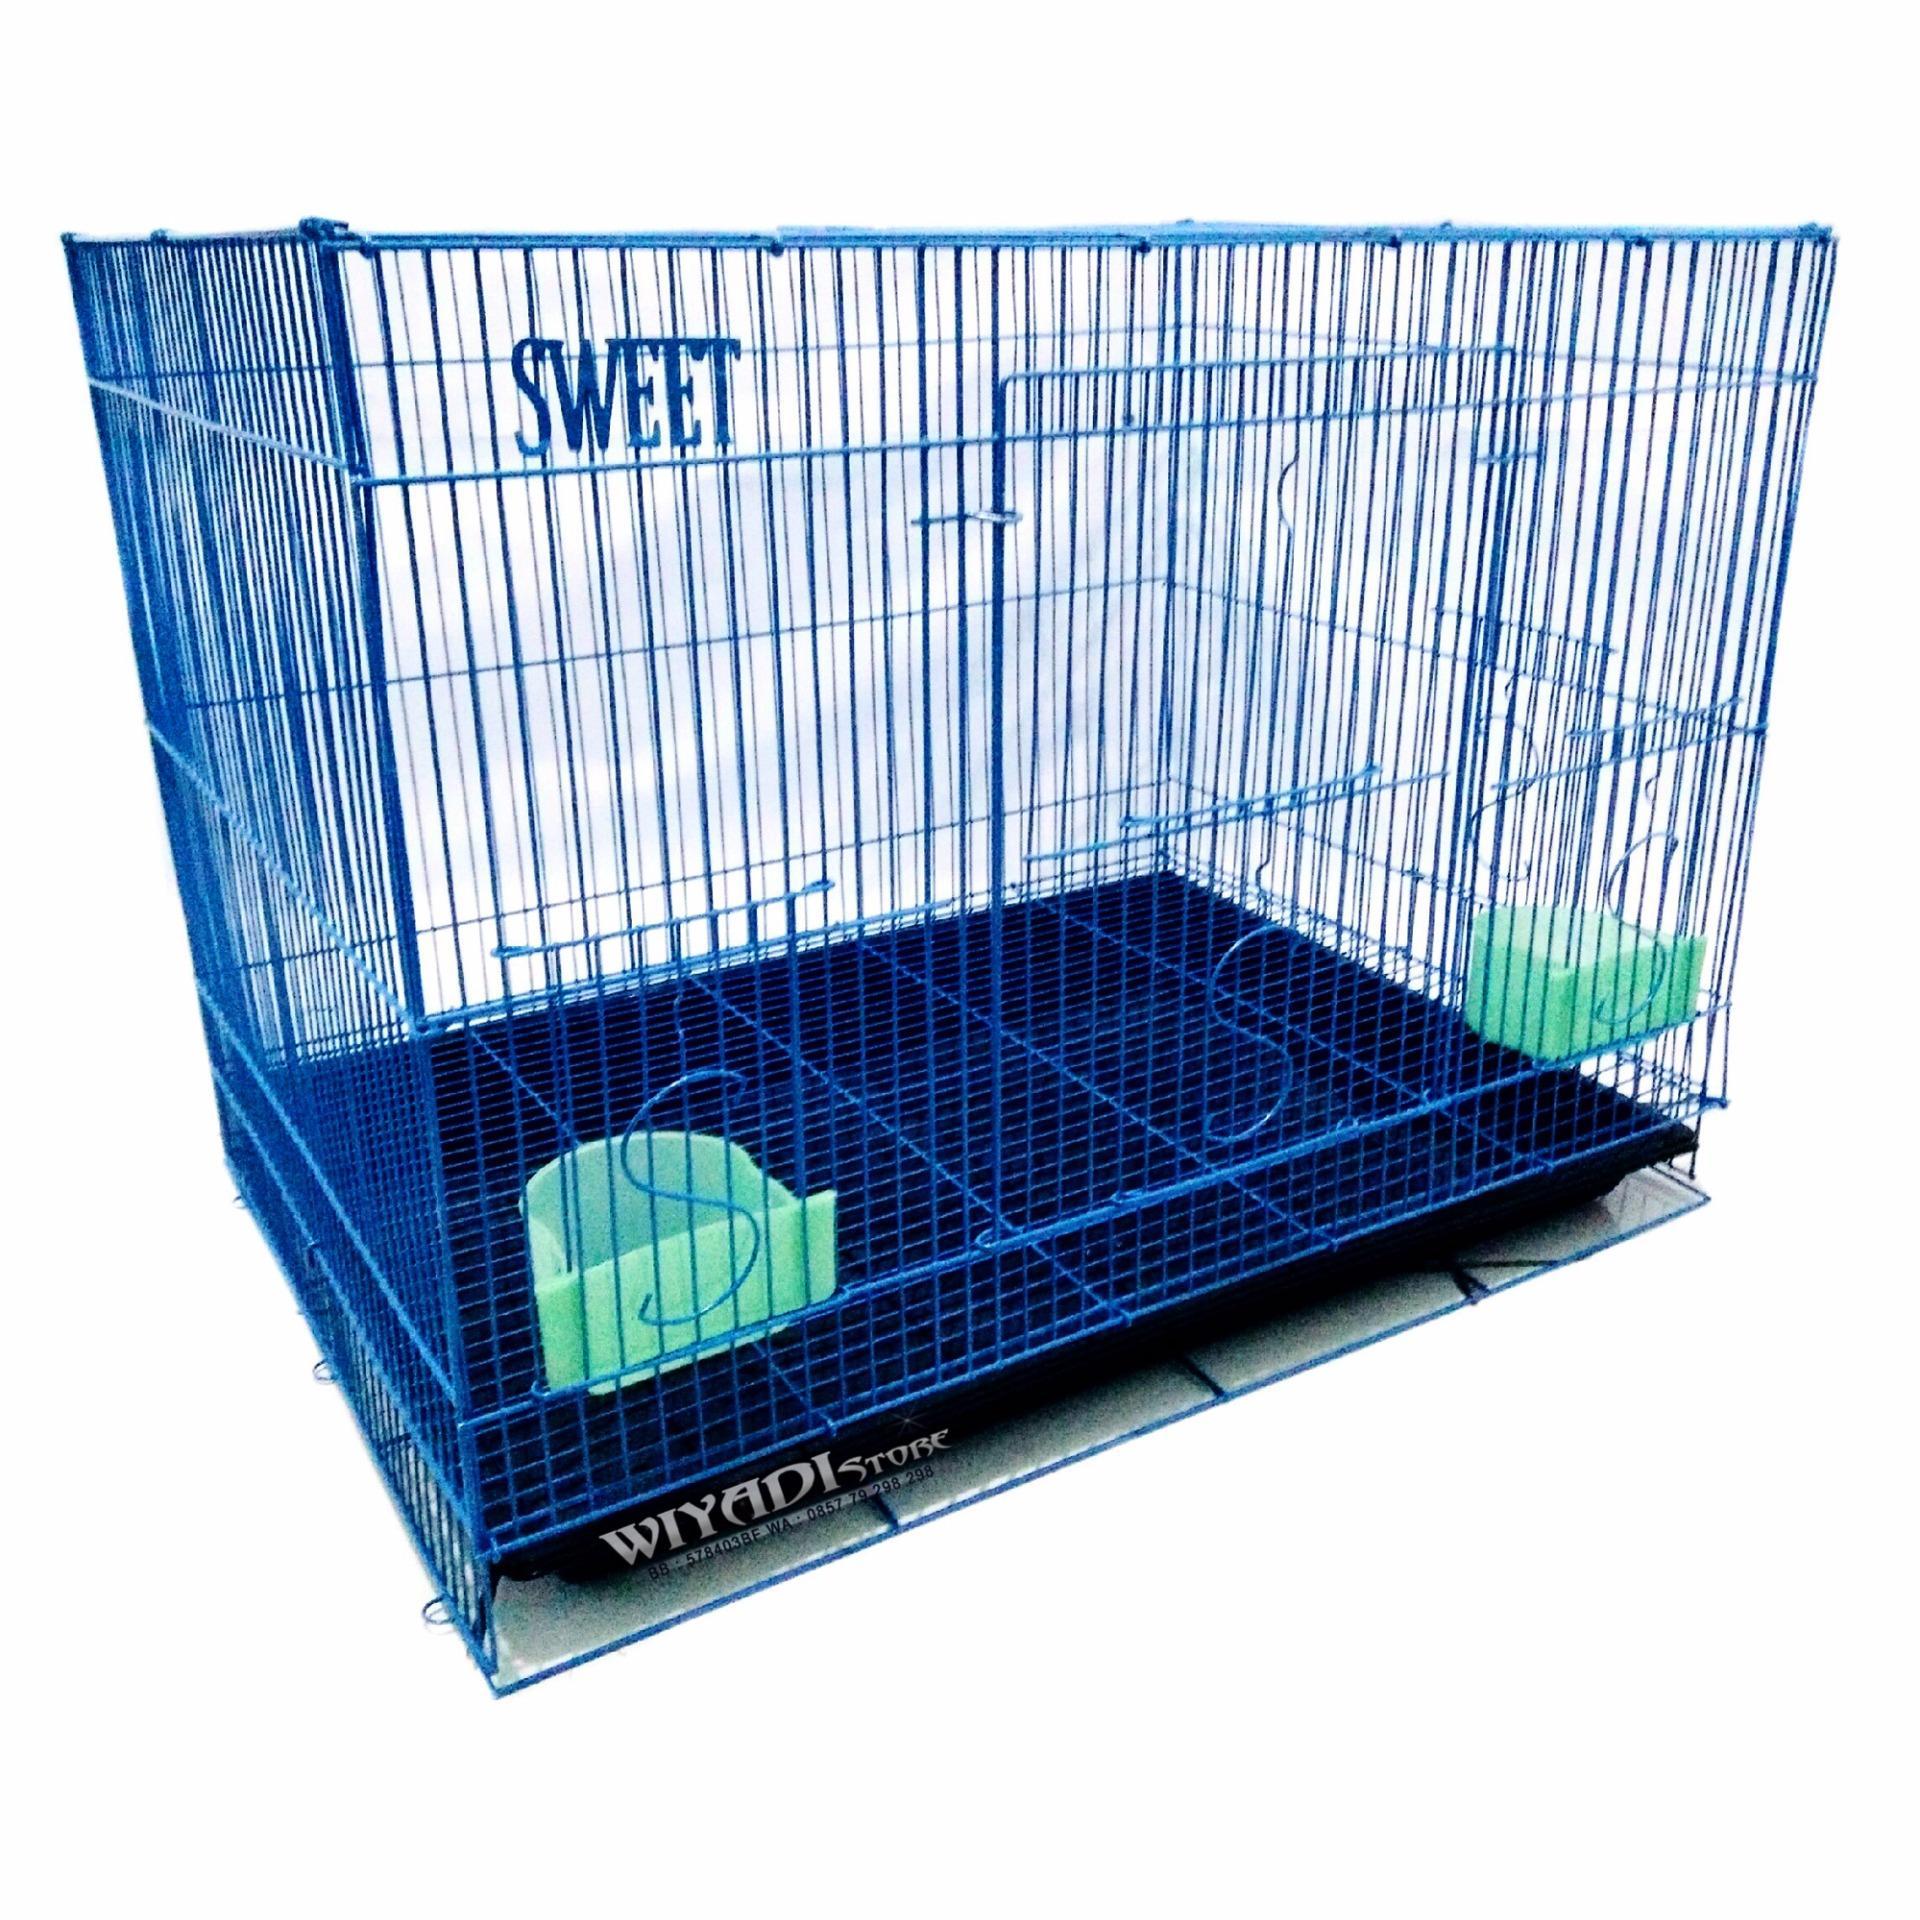 WiyadiStore - [K12] Kandang Kucing Besi Lipat Besar 60P - Biru